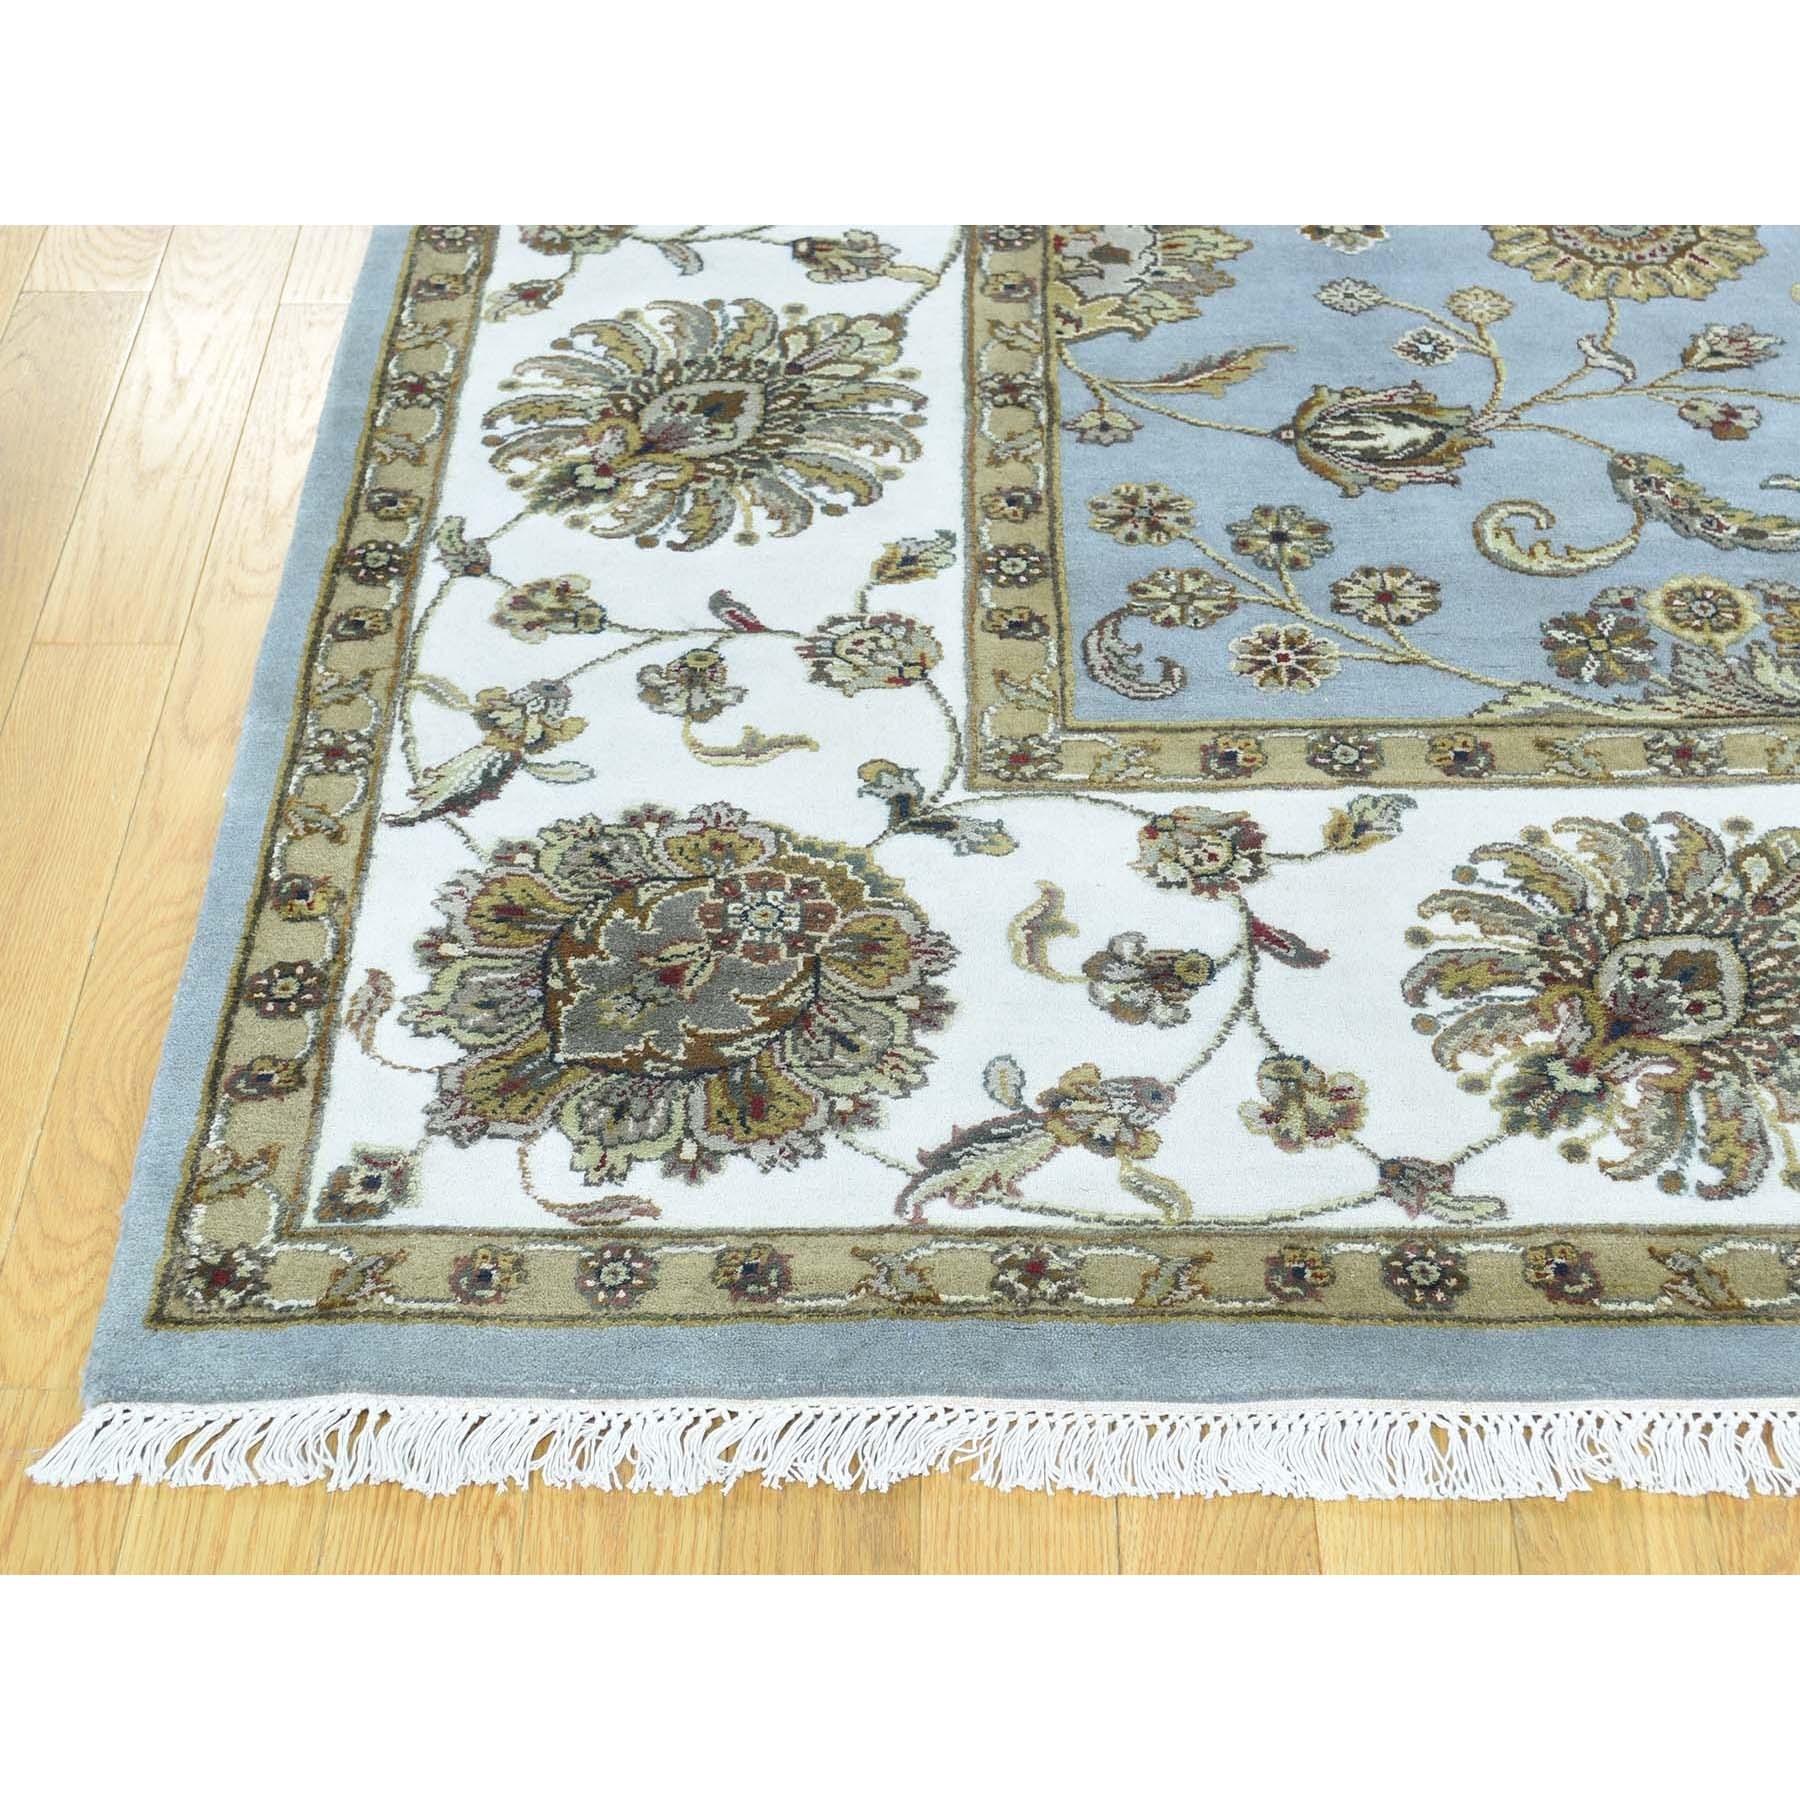 8'x10' Half Wool And Half Silk Hand-Knotted Rajasthan Silk Flower Rug